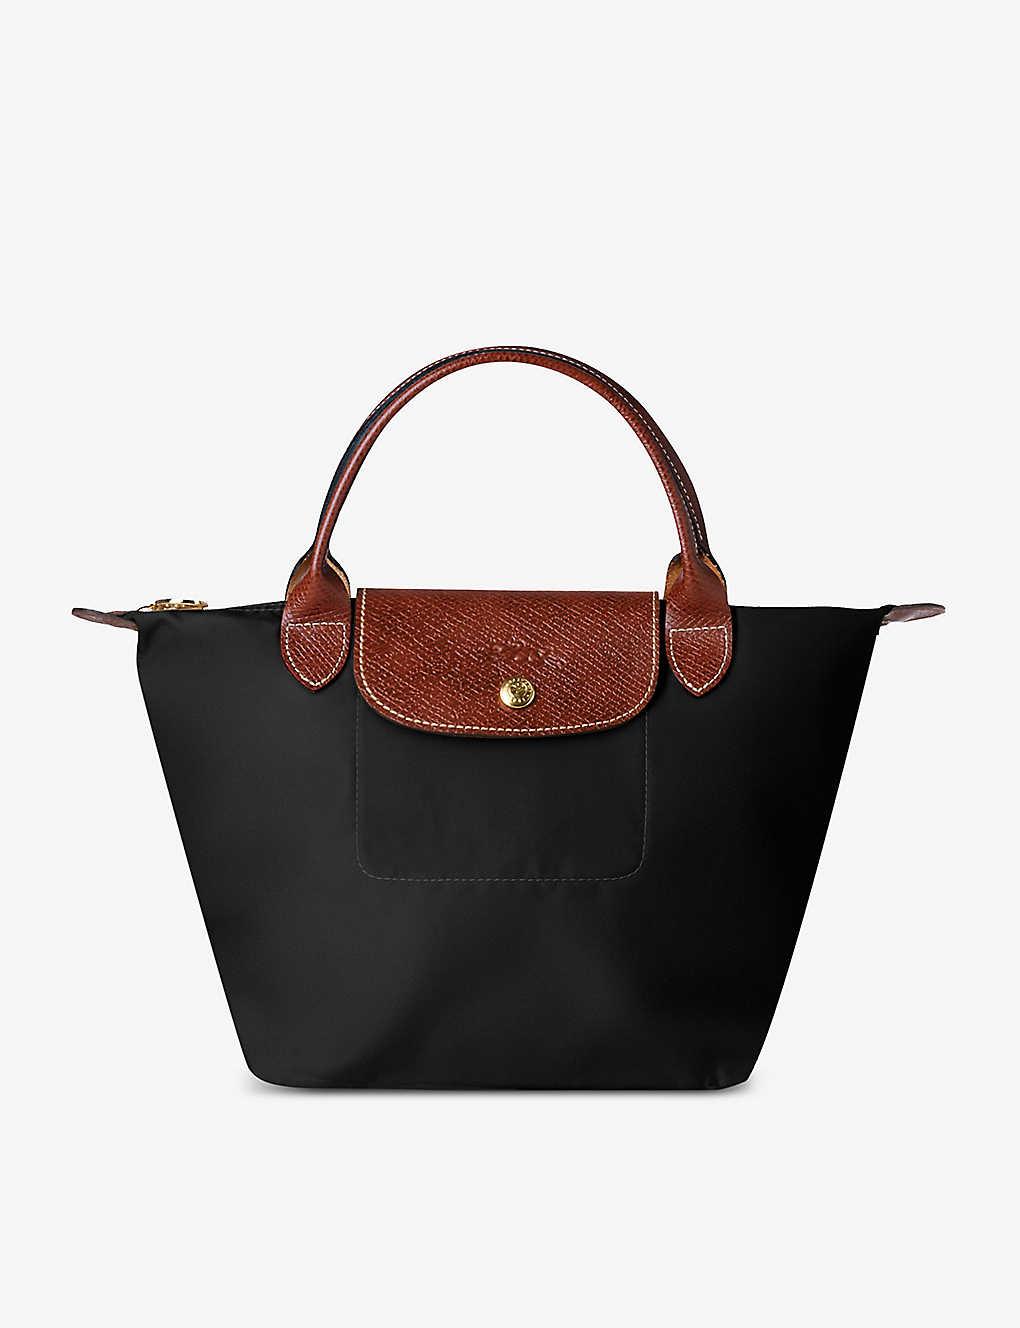 524c7effc5 LONGCHAMP - Le Pliage small handbag | Selfridges.com